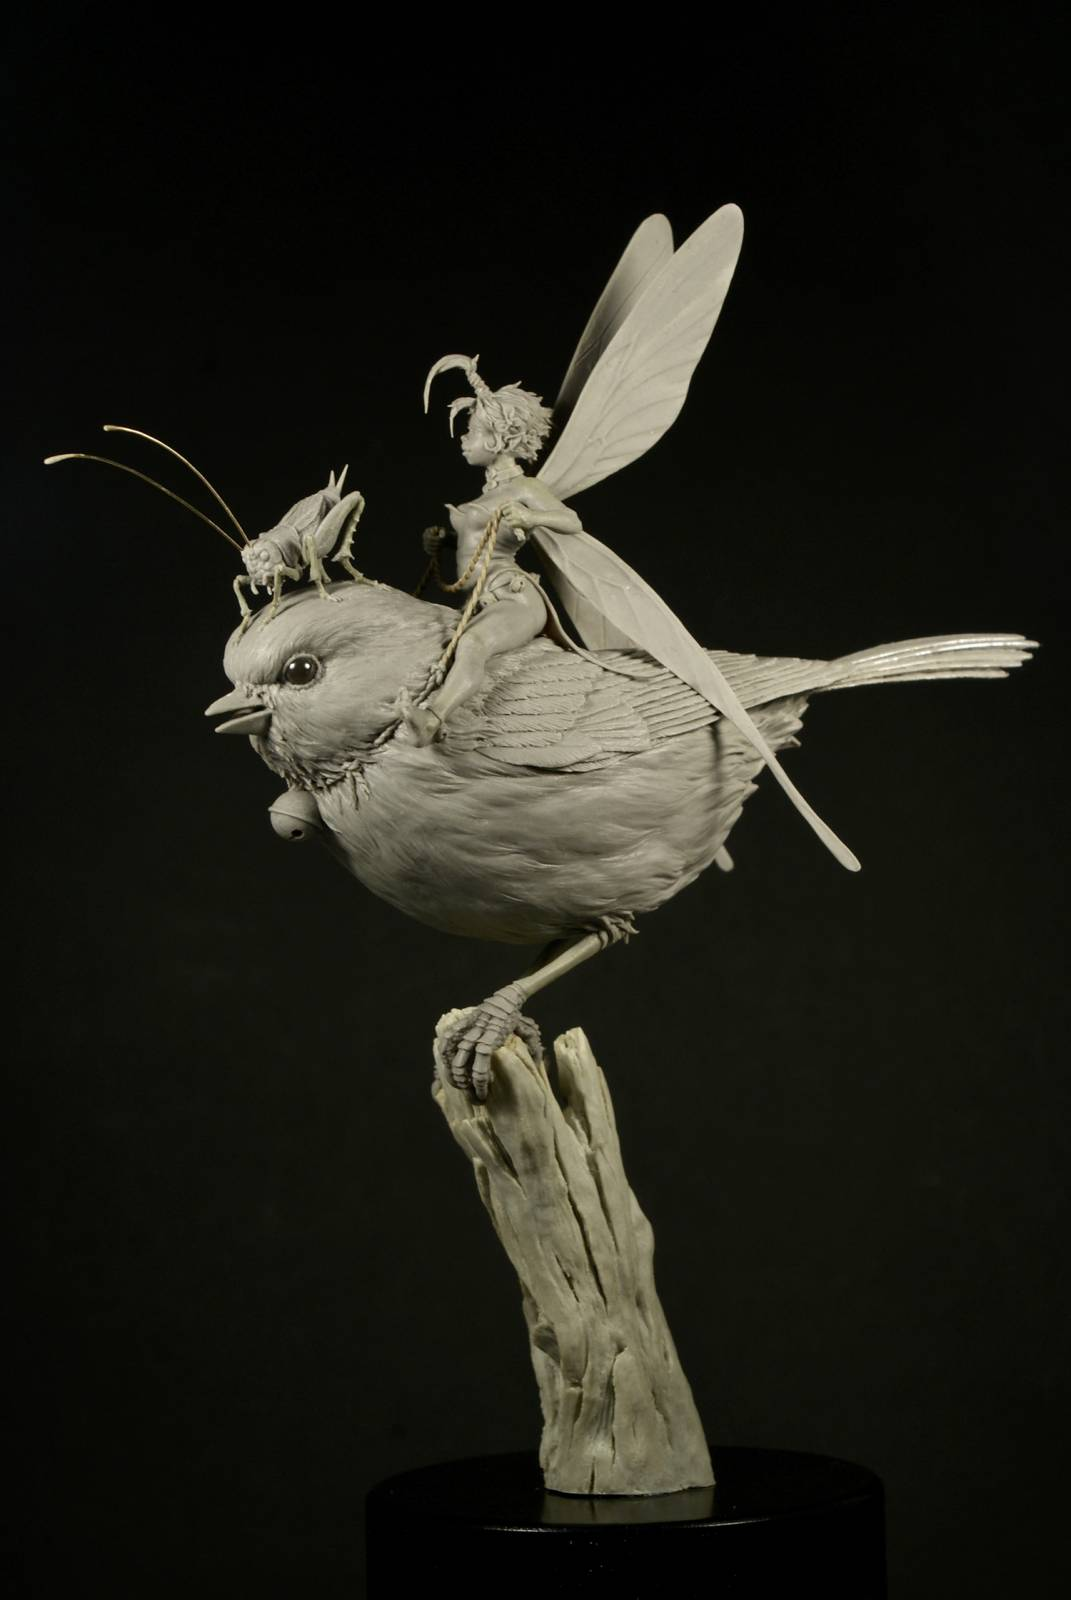 Sculpey sculpture